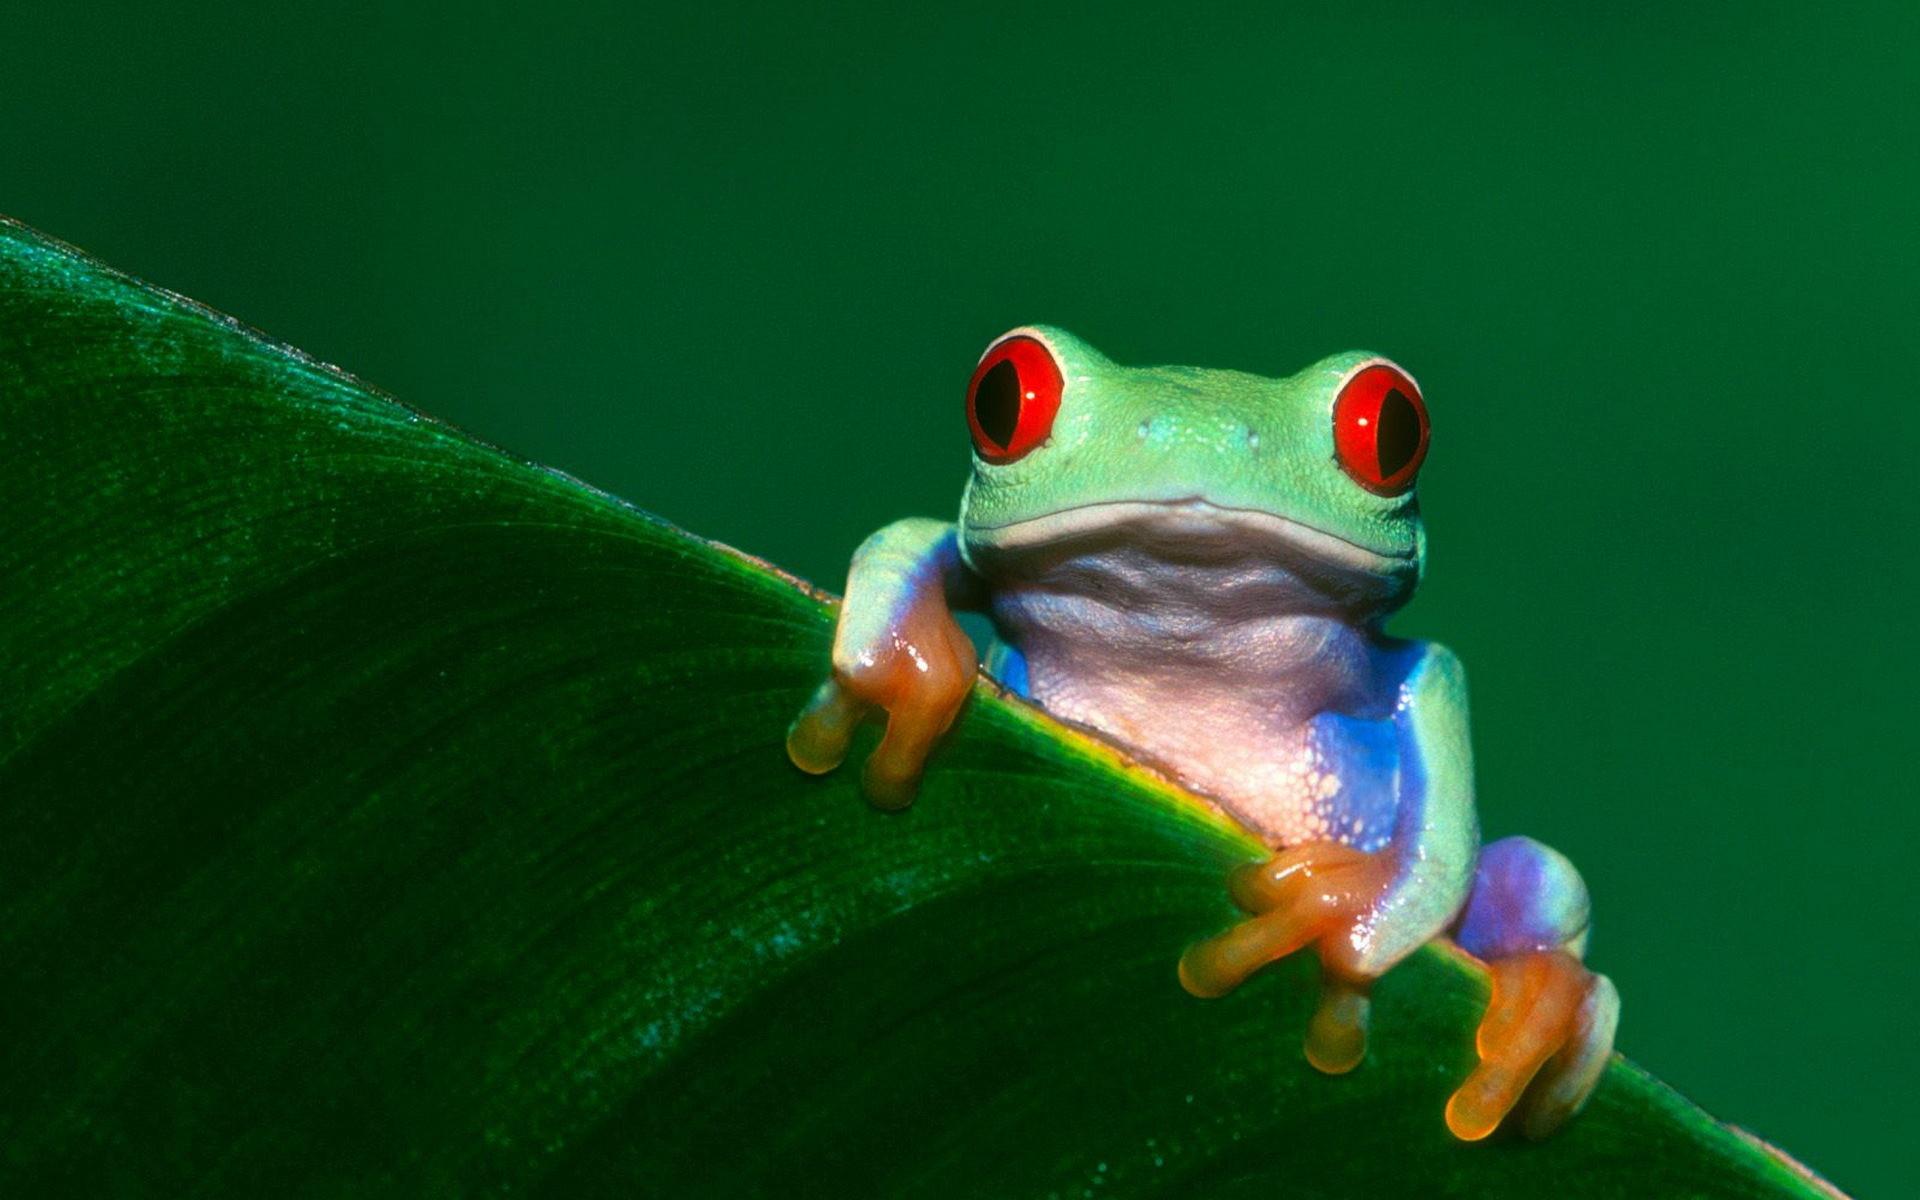 … Tree Frog Wallpapers HD …